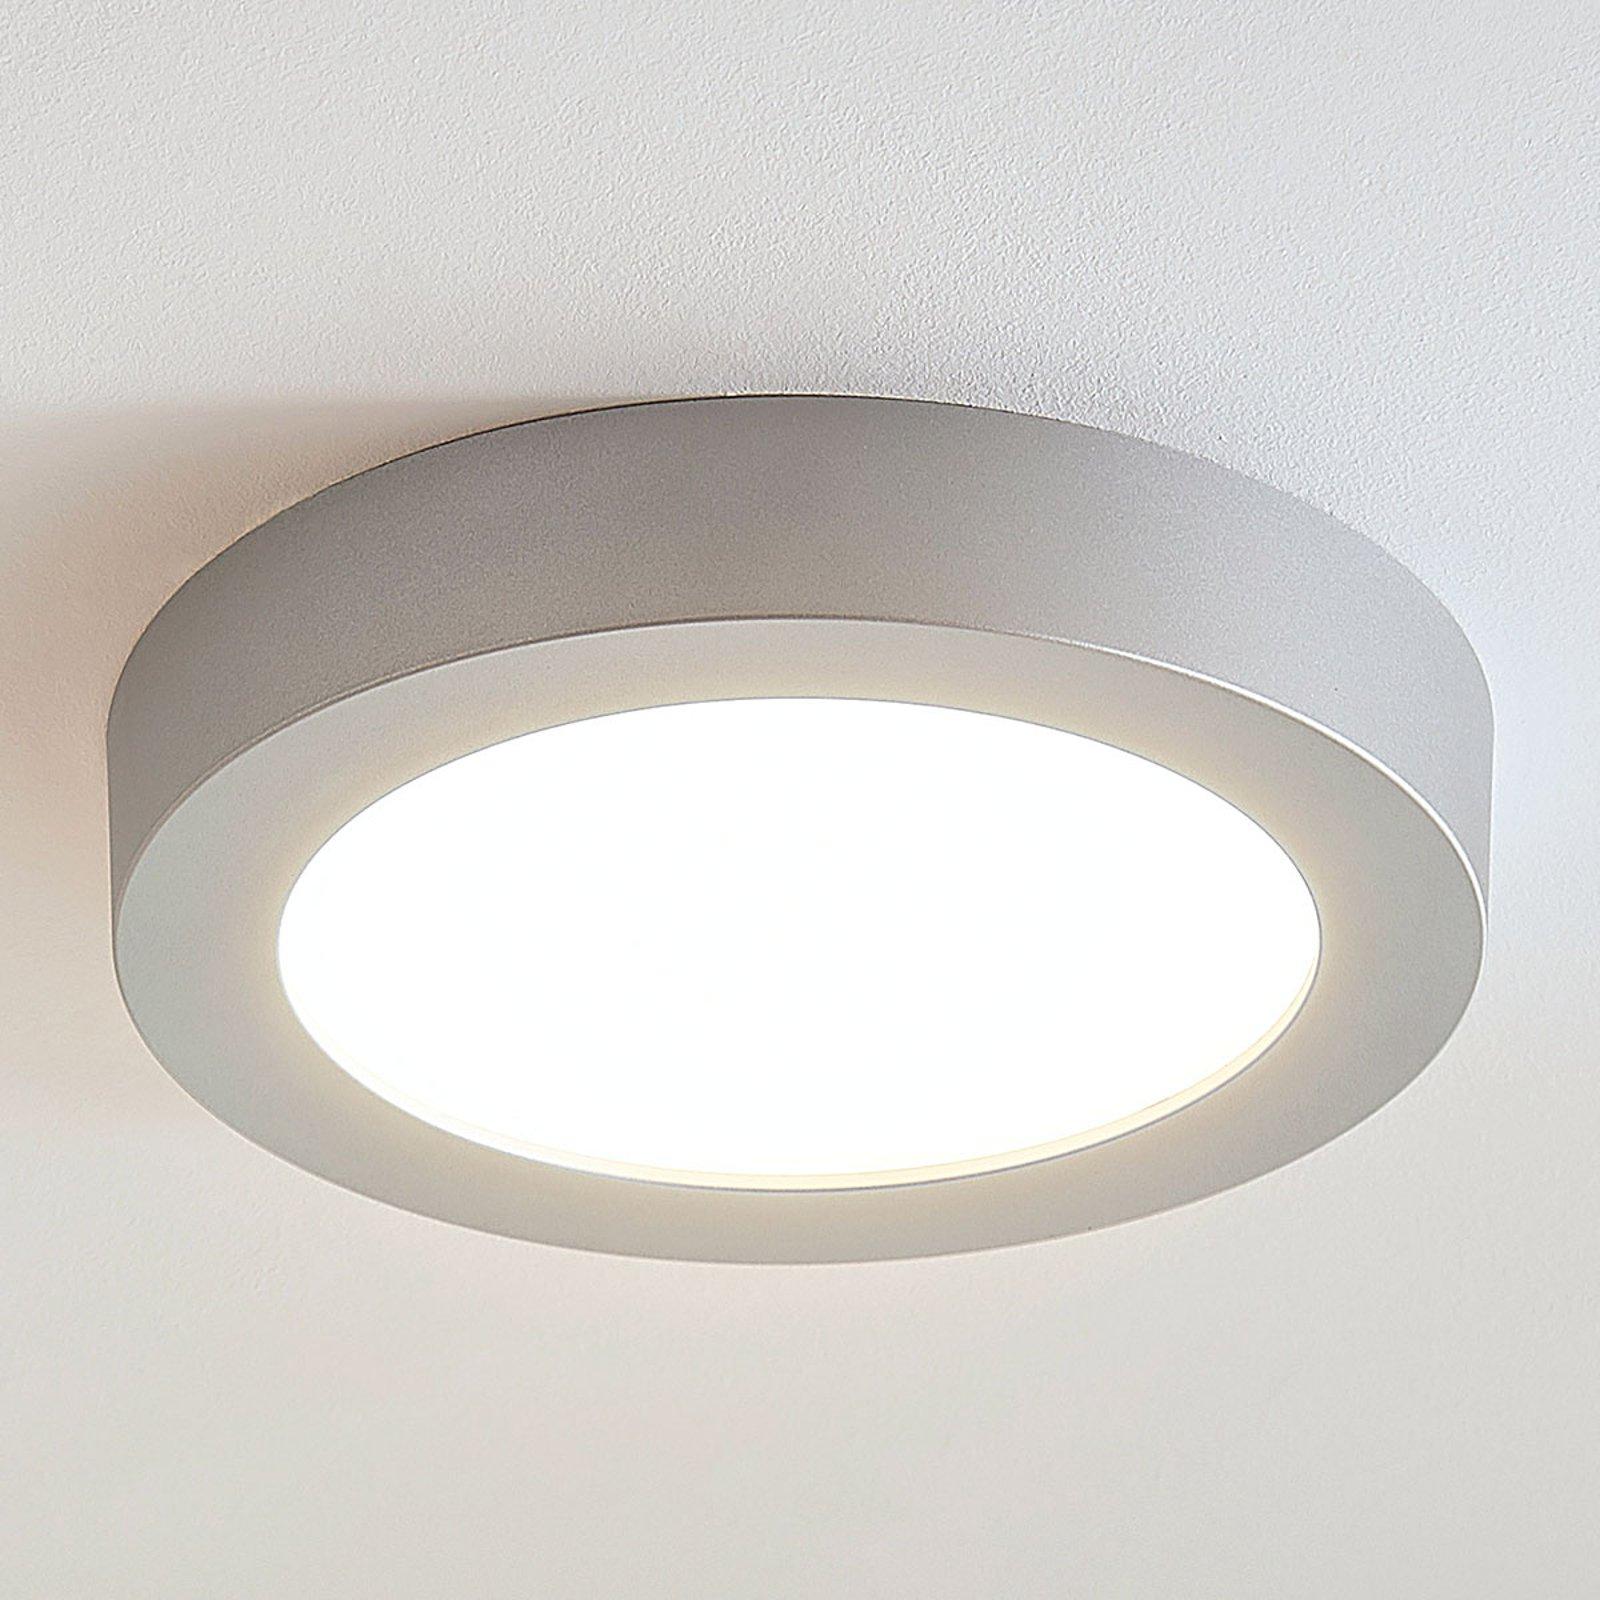 LED-taklampe Marlo sølv 3 000K rund 25,2cm